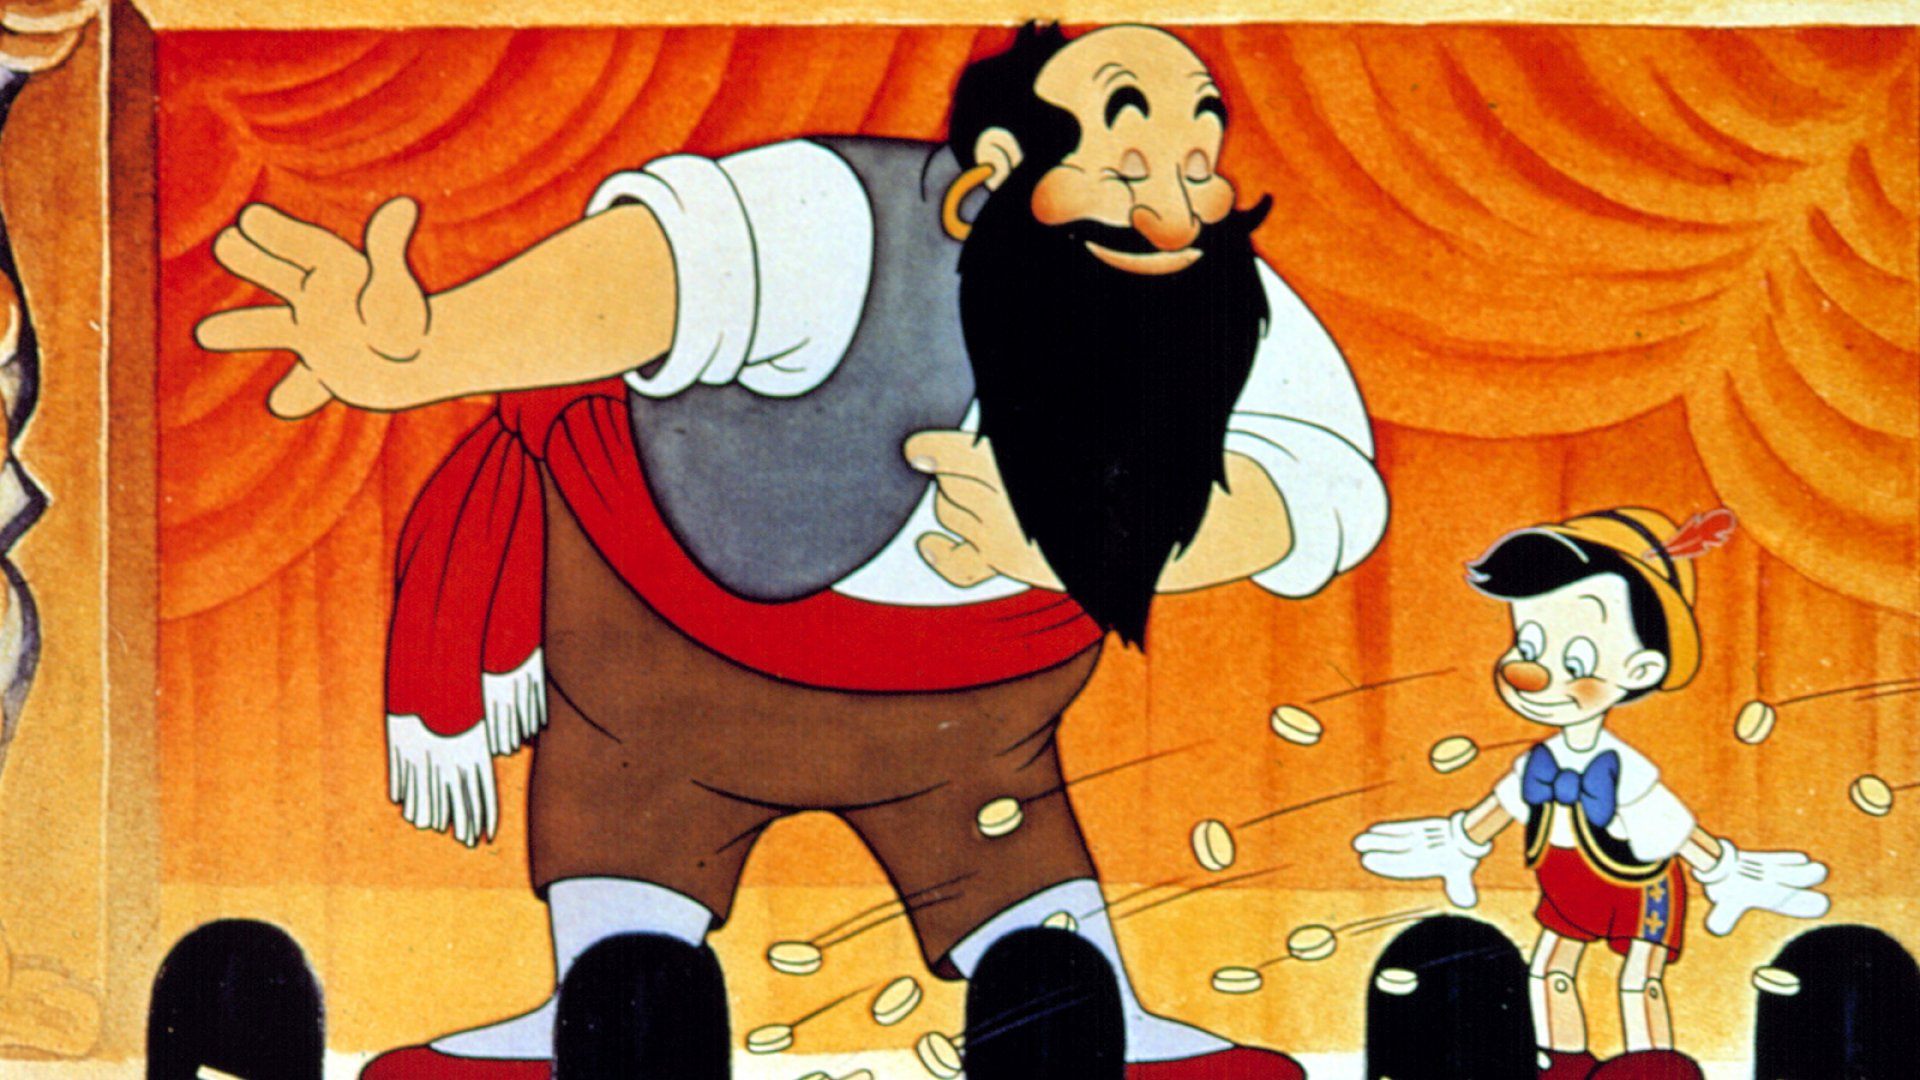 Stromboli and Pinocchio from the 1940's classic <i>Pinocchio</i>.